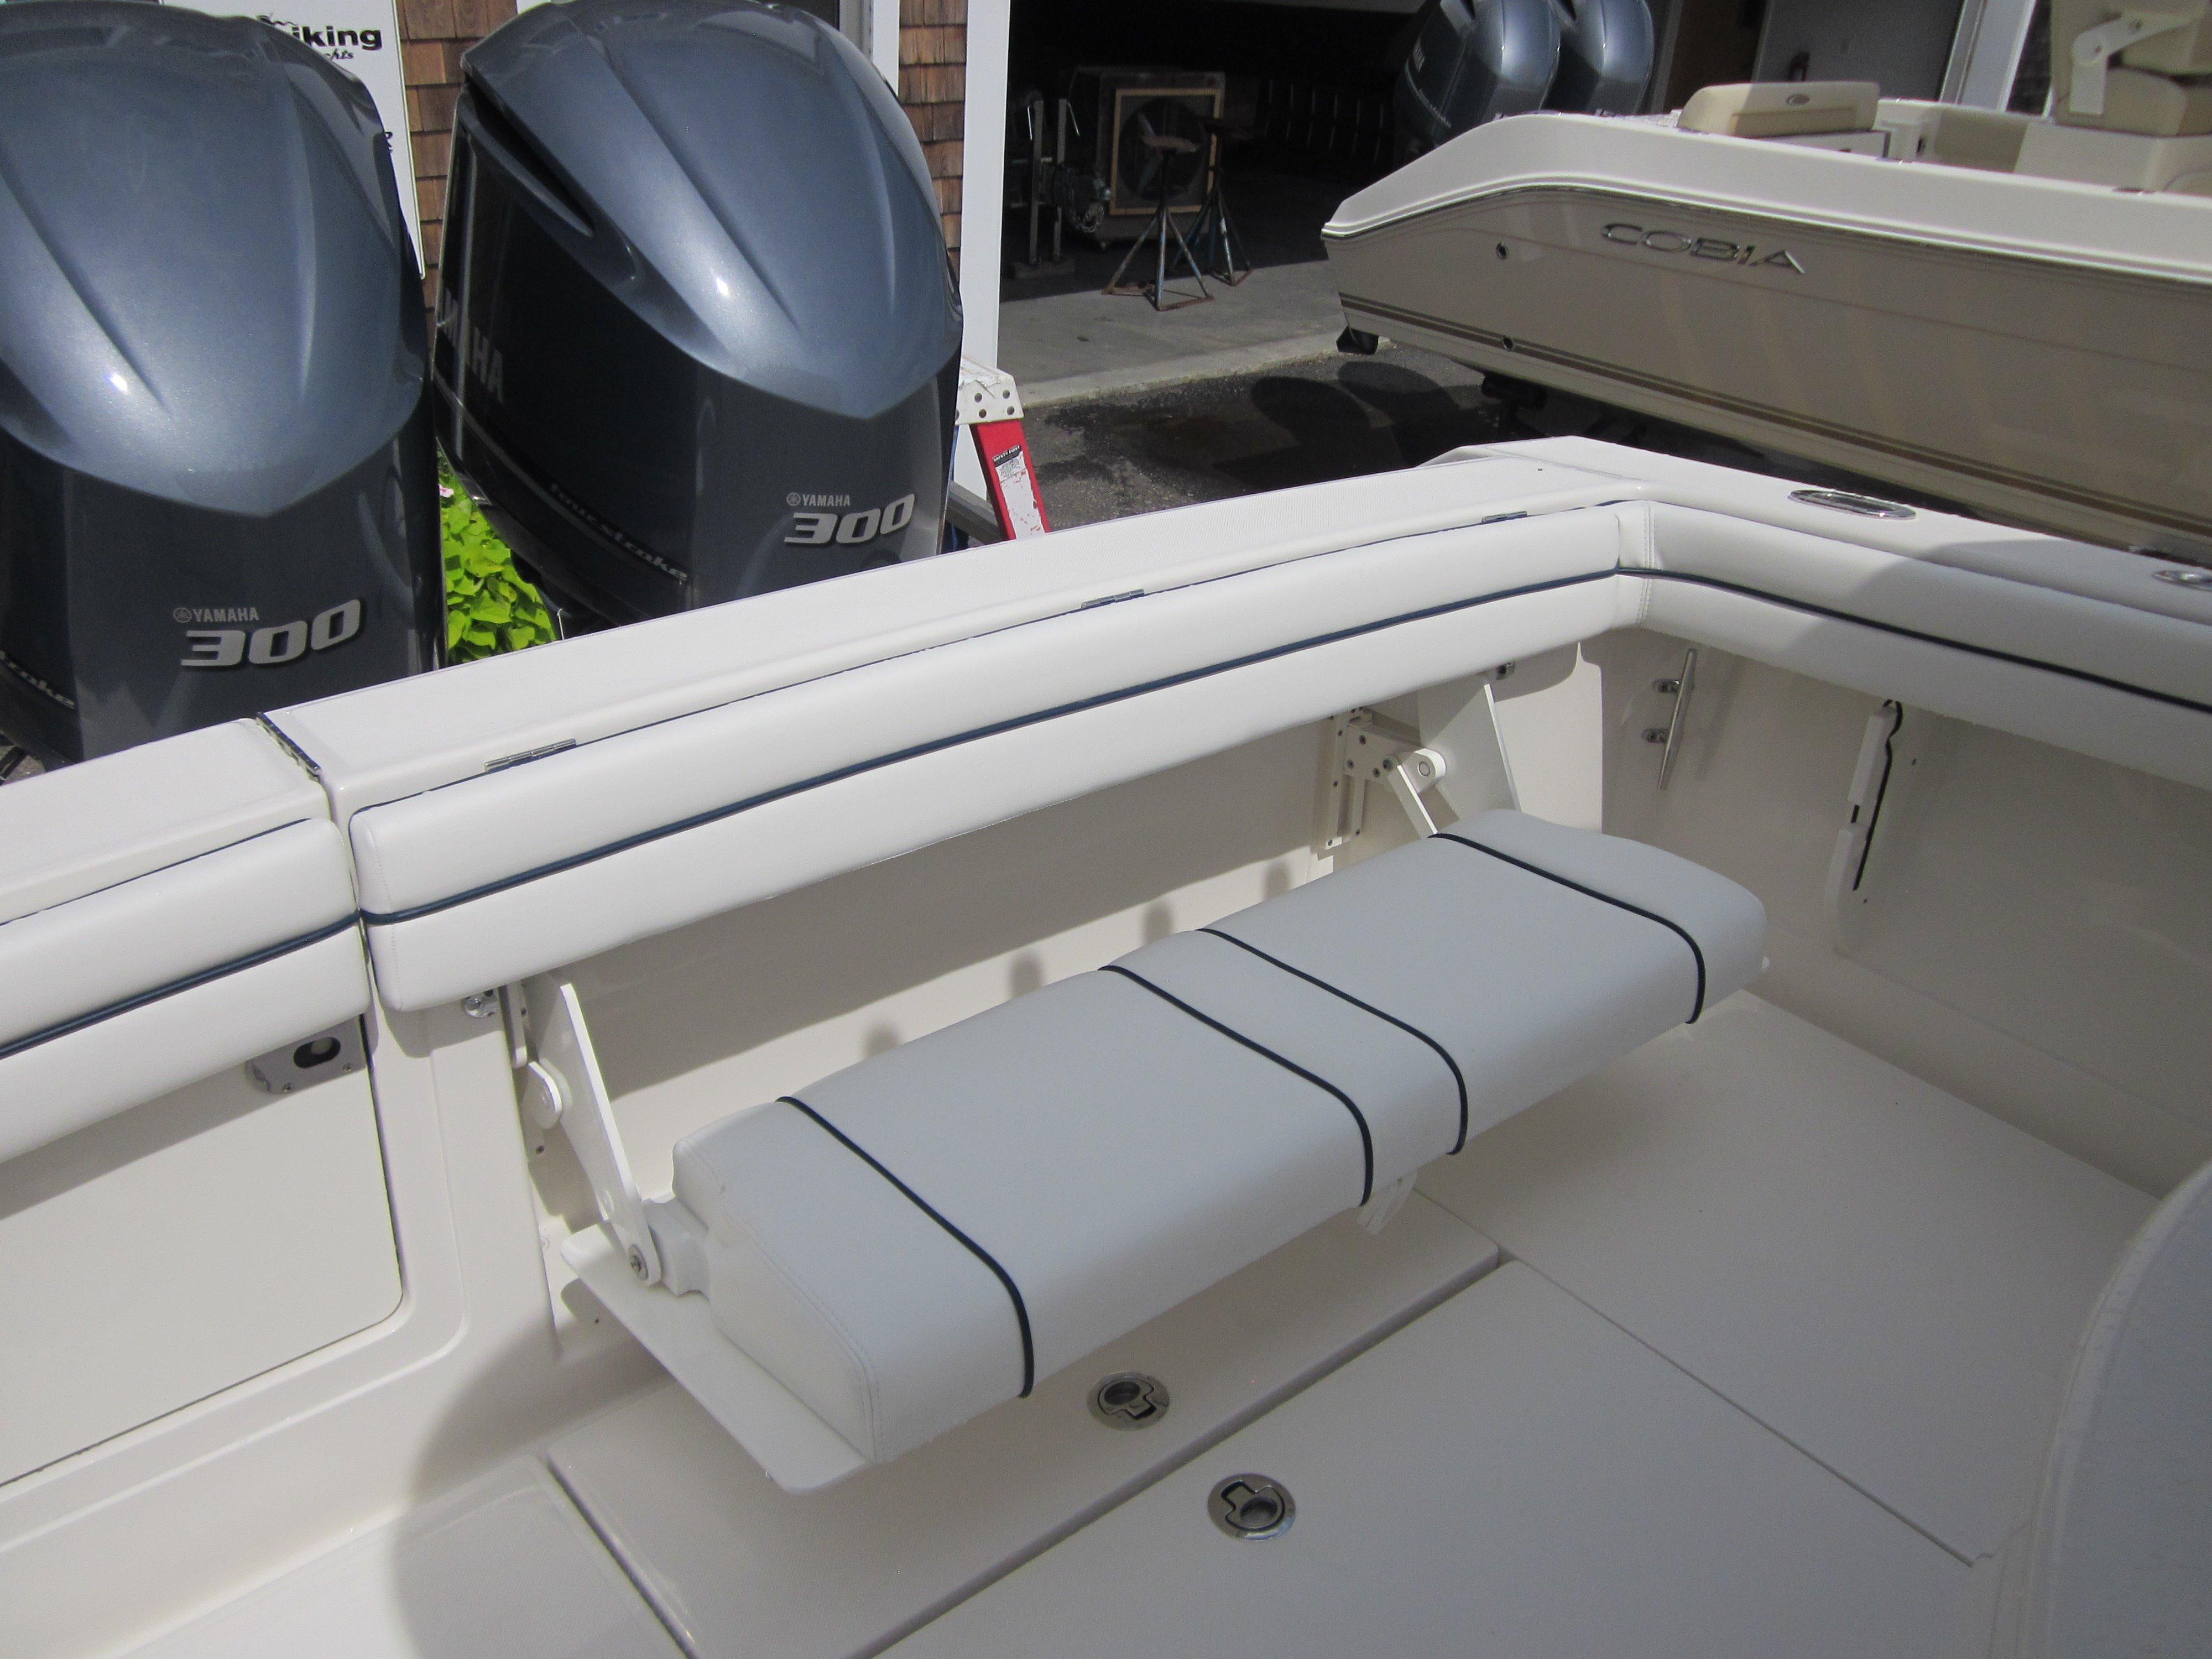 Jupiter30 HFS